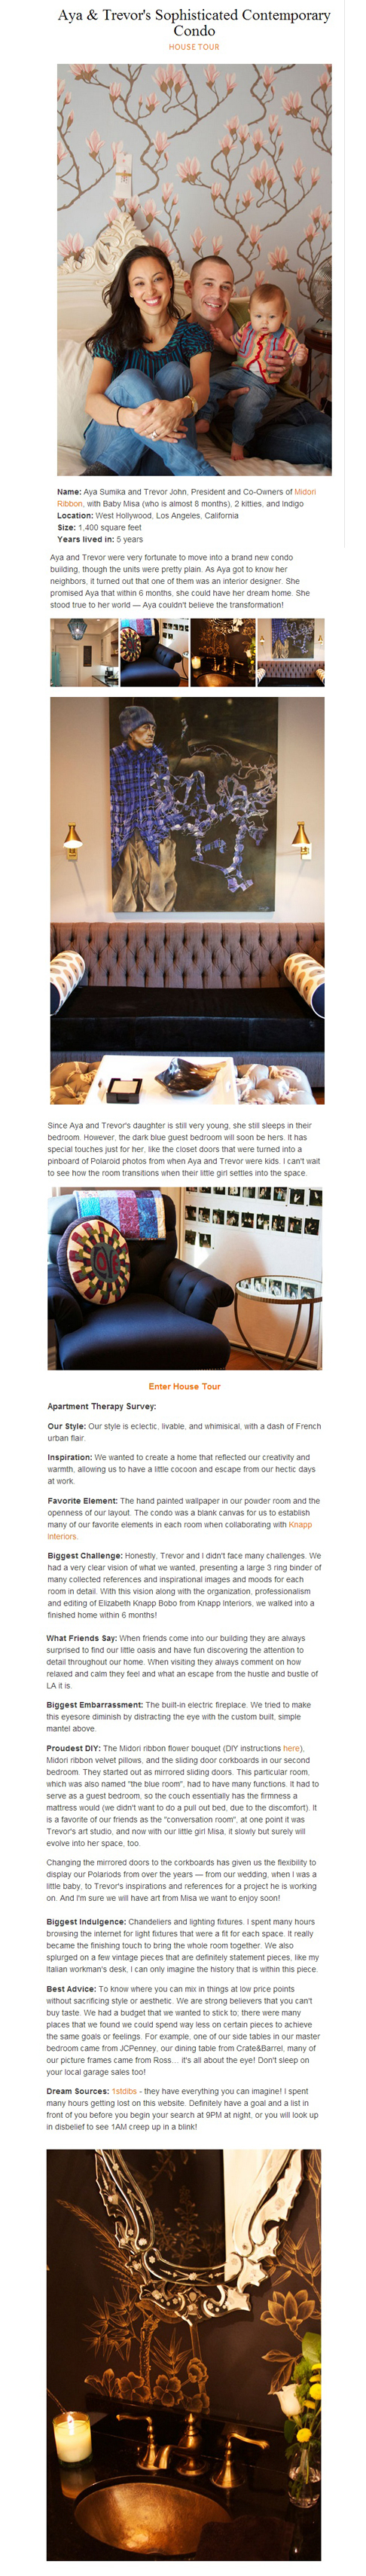 apartment-therapy-dec-2012.jpg